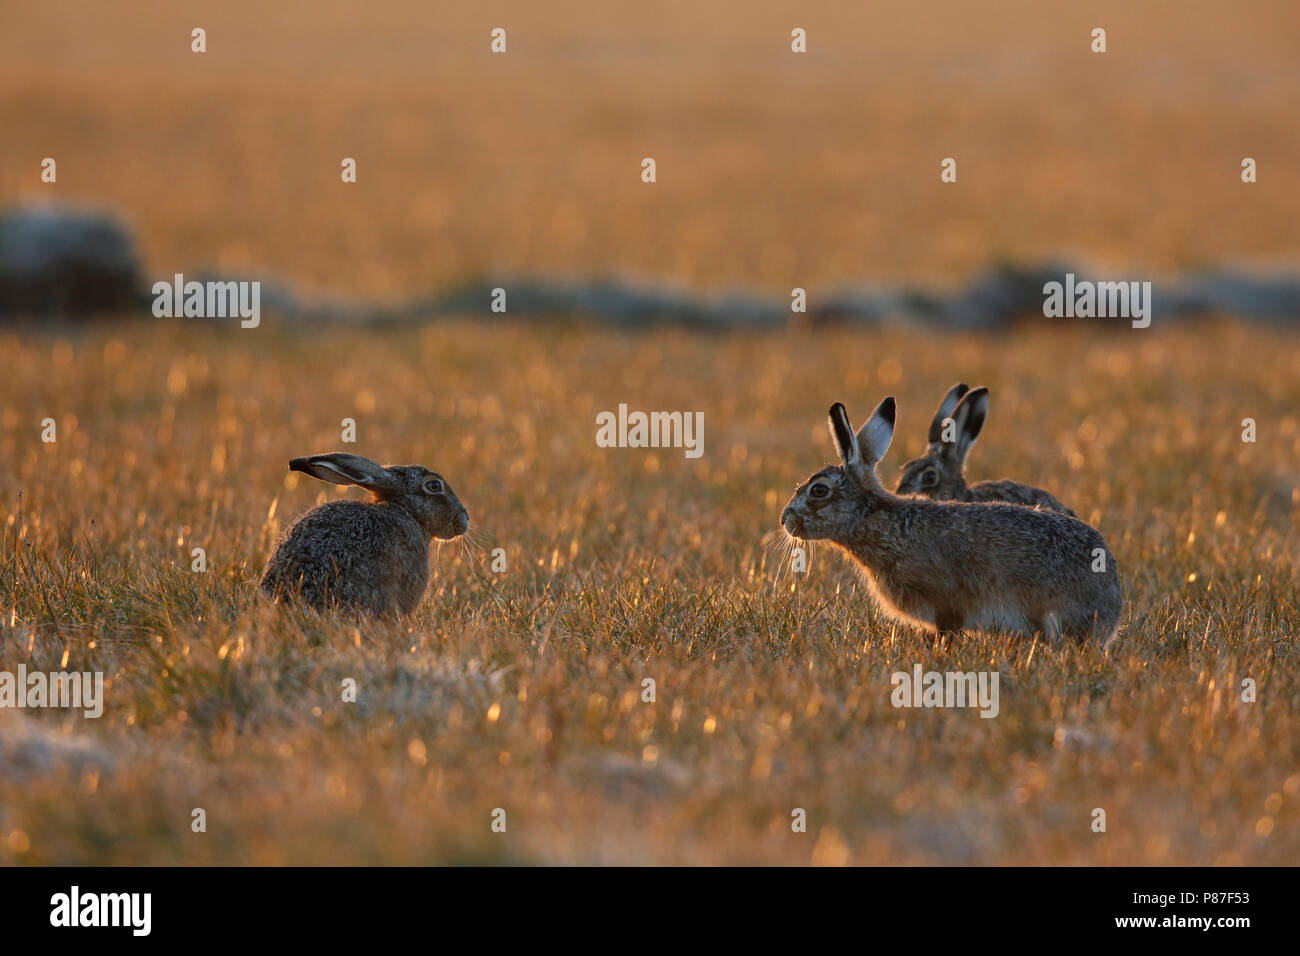 haas in ochtend licht; hare in morning light - Stock Image